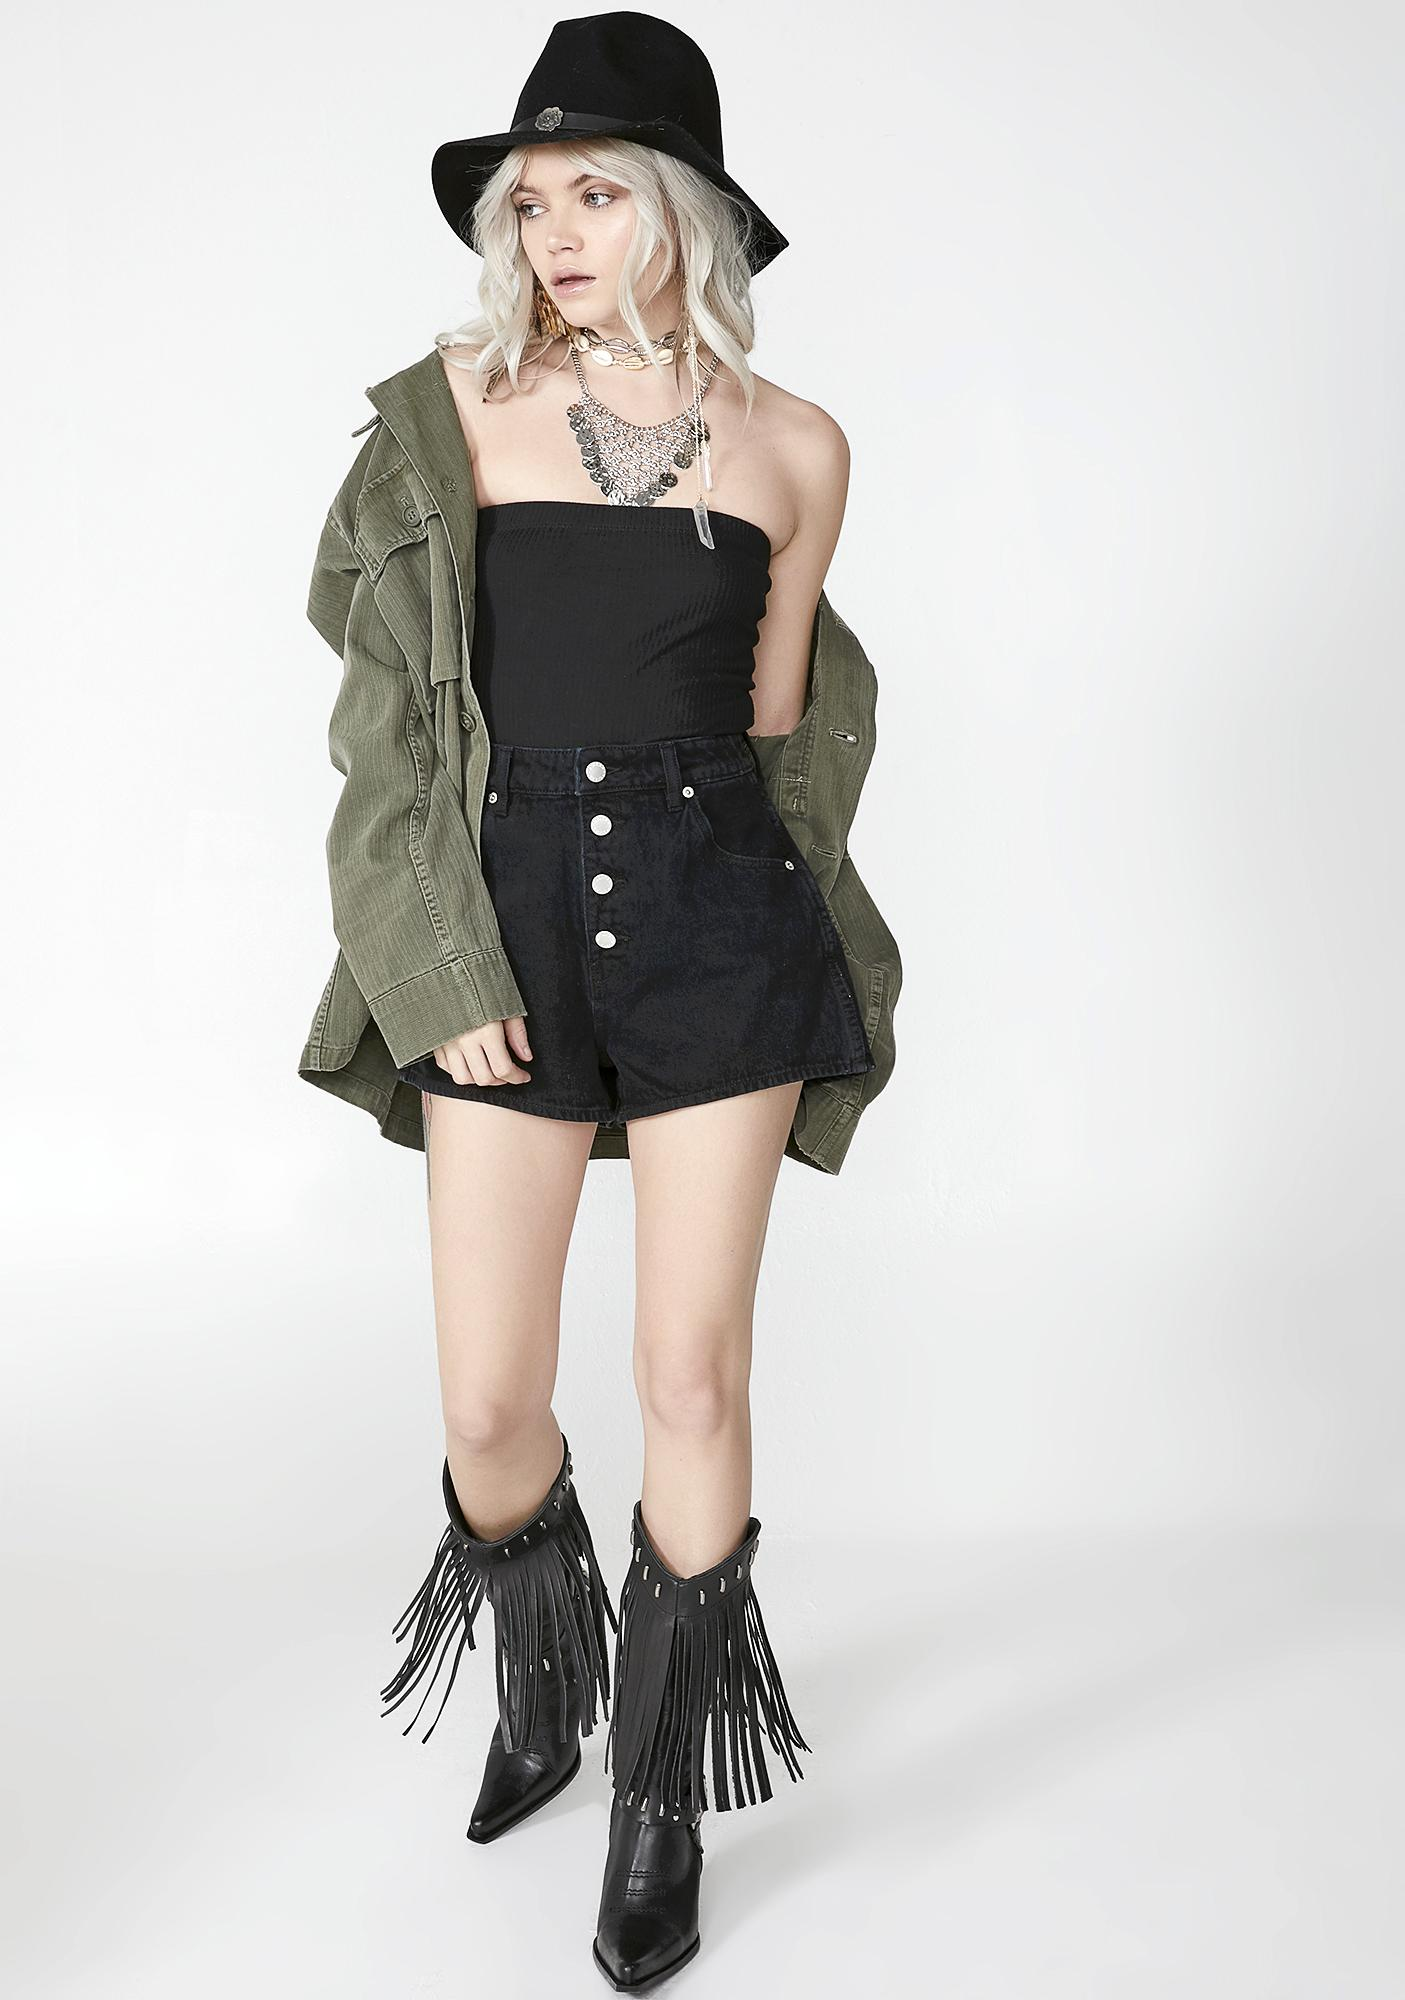 Bad Habitz Strapless Bodysuit